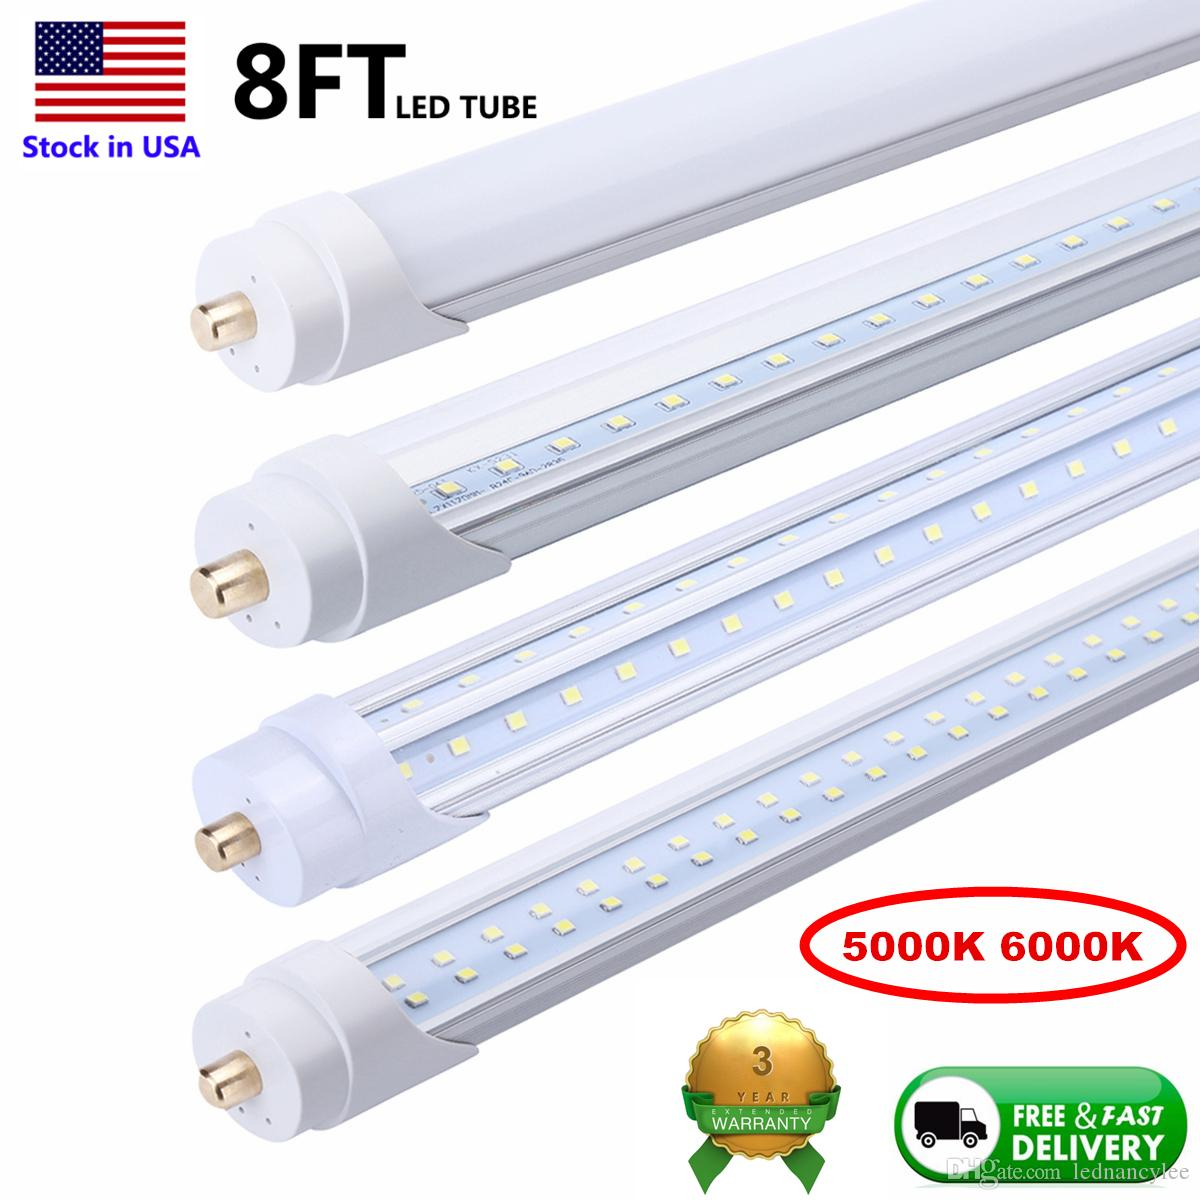 LED 튜브 램프 8피트 8피트 LED 튜브 단일 핀 FA8 LED 전구 8피트는 형광 튜브 라이트 V 모양의 튜브 5000K 6000K 교체